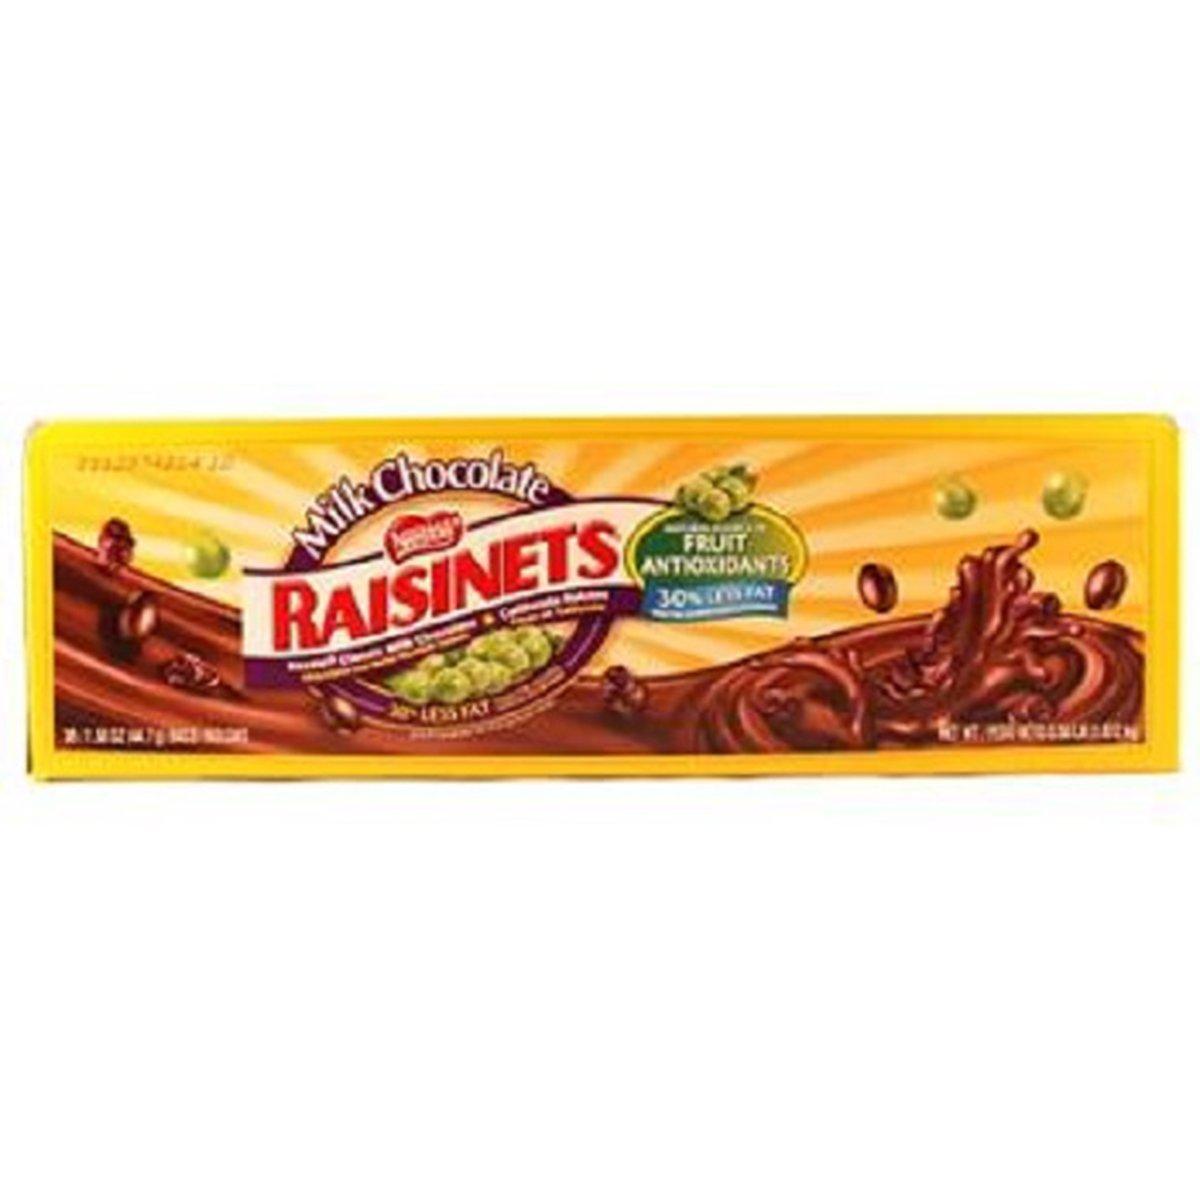 Product Of Raisinets, Milk Chocolate W/Raisins, Count 36 (1.58 oz) - Chocolate Candy / Grab Varieties & Flavors